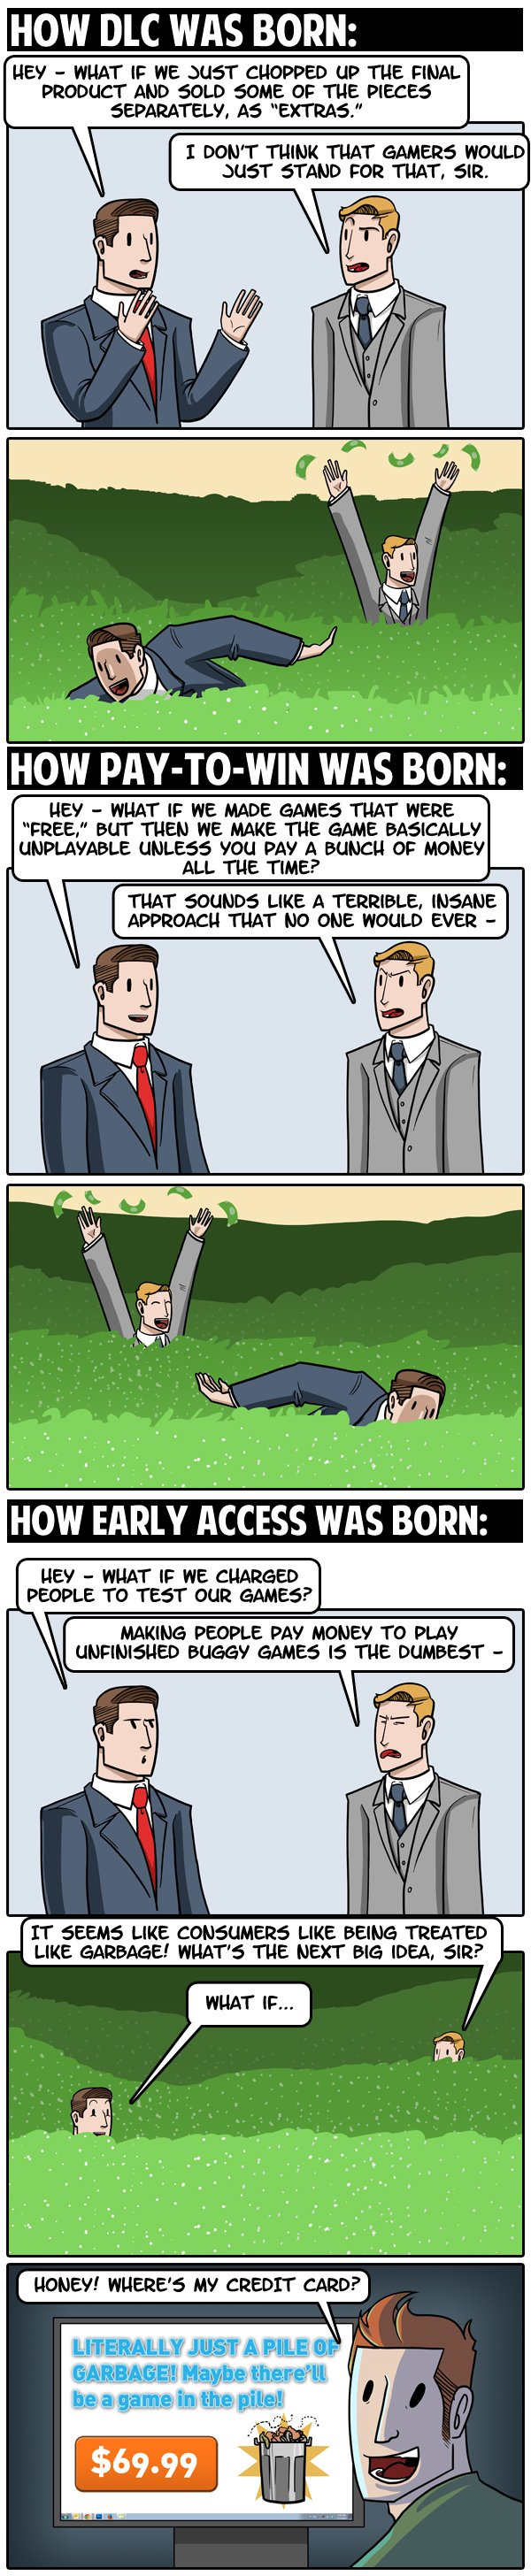 The life of DLC.jpg